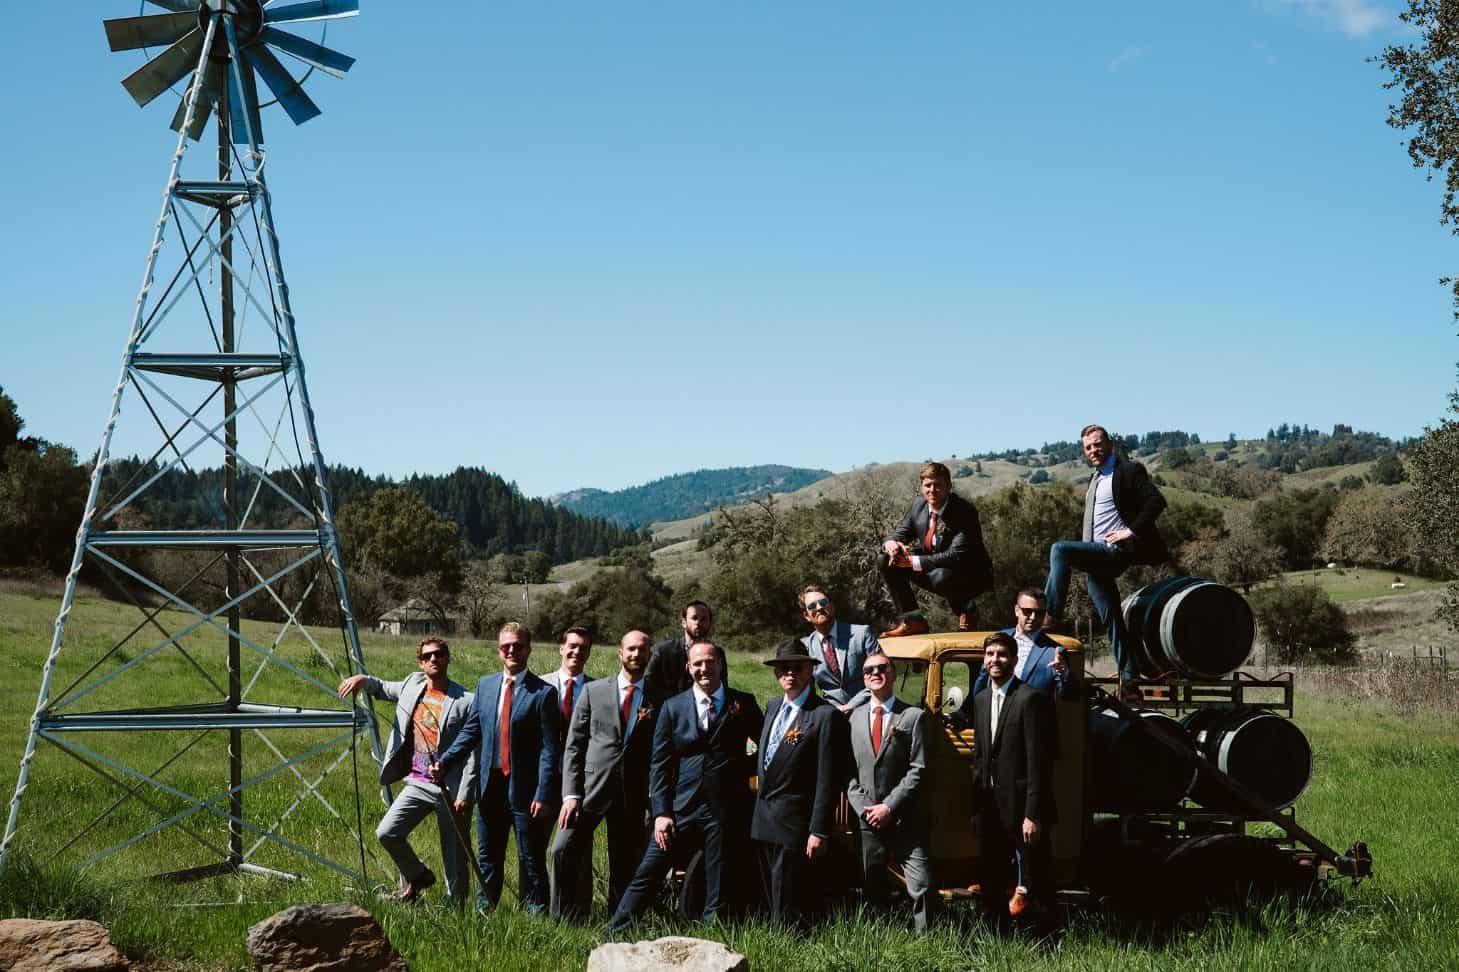 20 photo opportunities rustic mountain house estate weddingi venues northern california